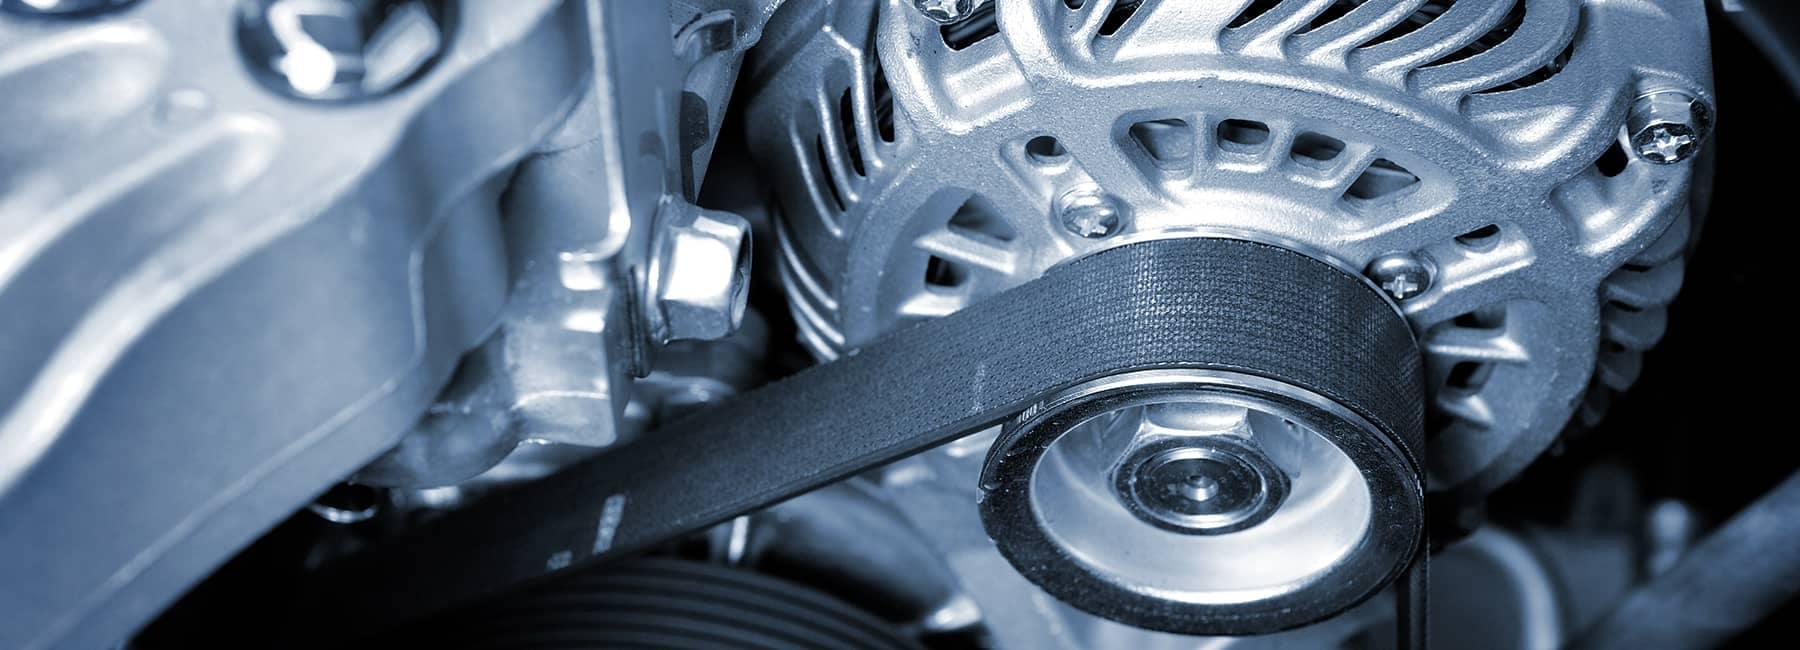 Belt on engine